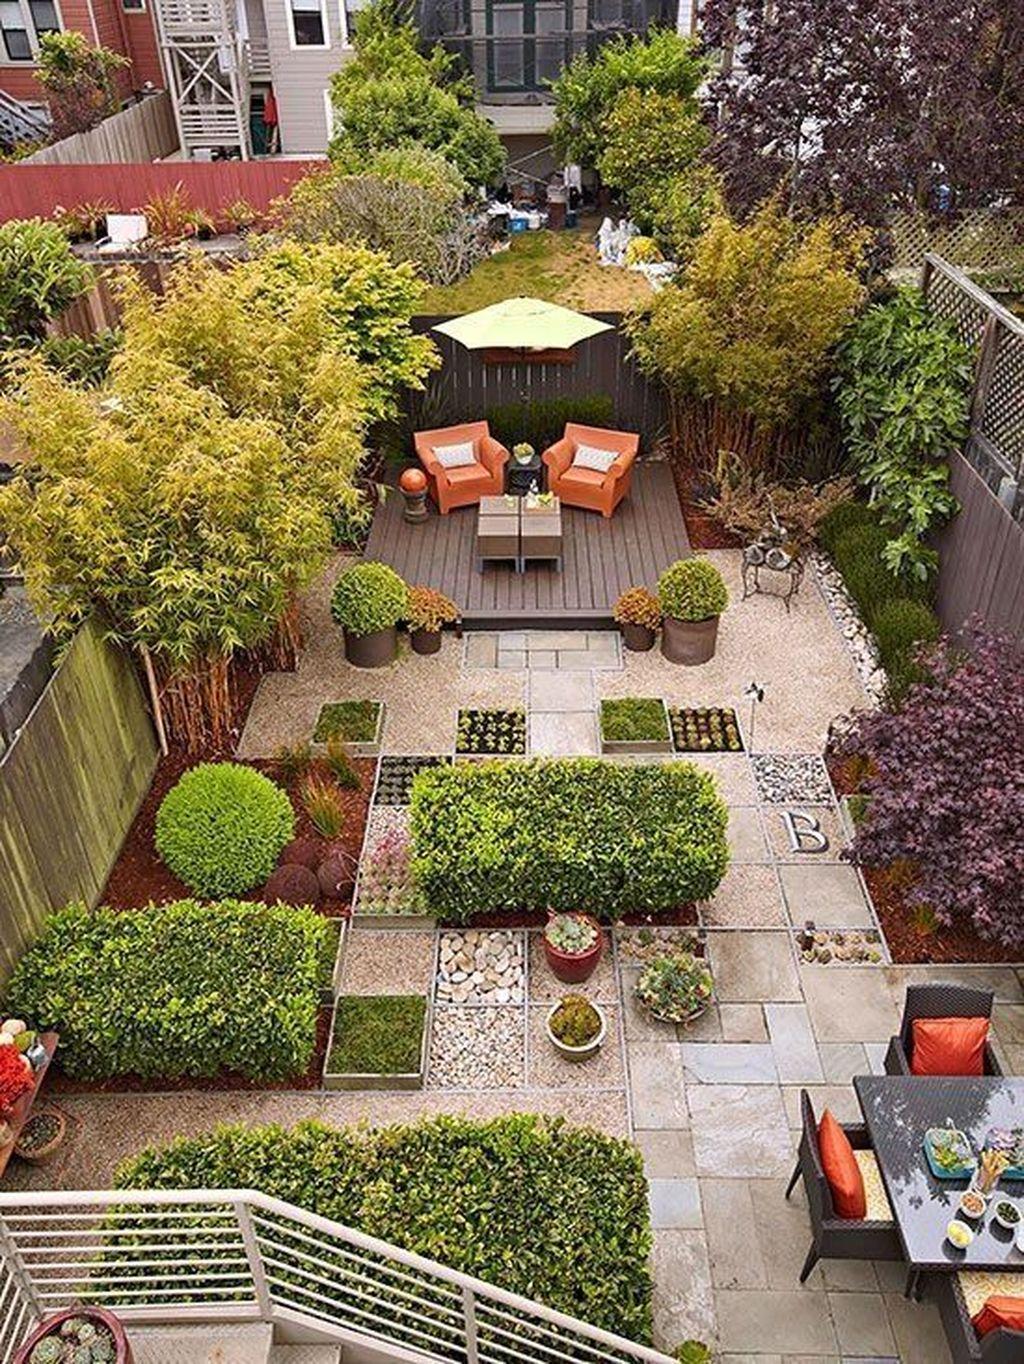 Inspiring Minimalist Frontyard Design Ideas To Try Asap 06